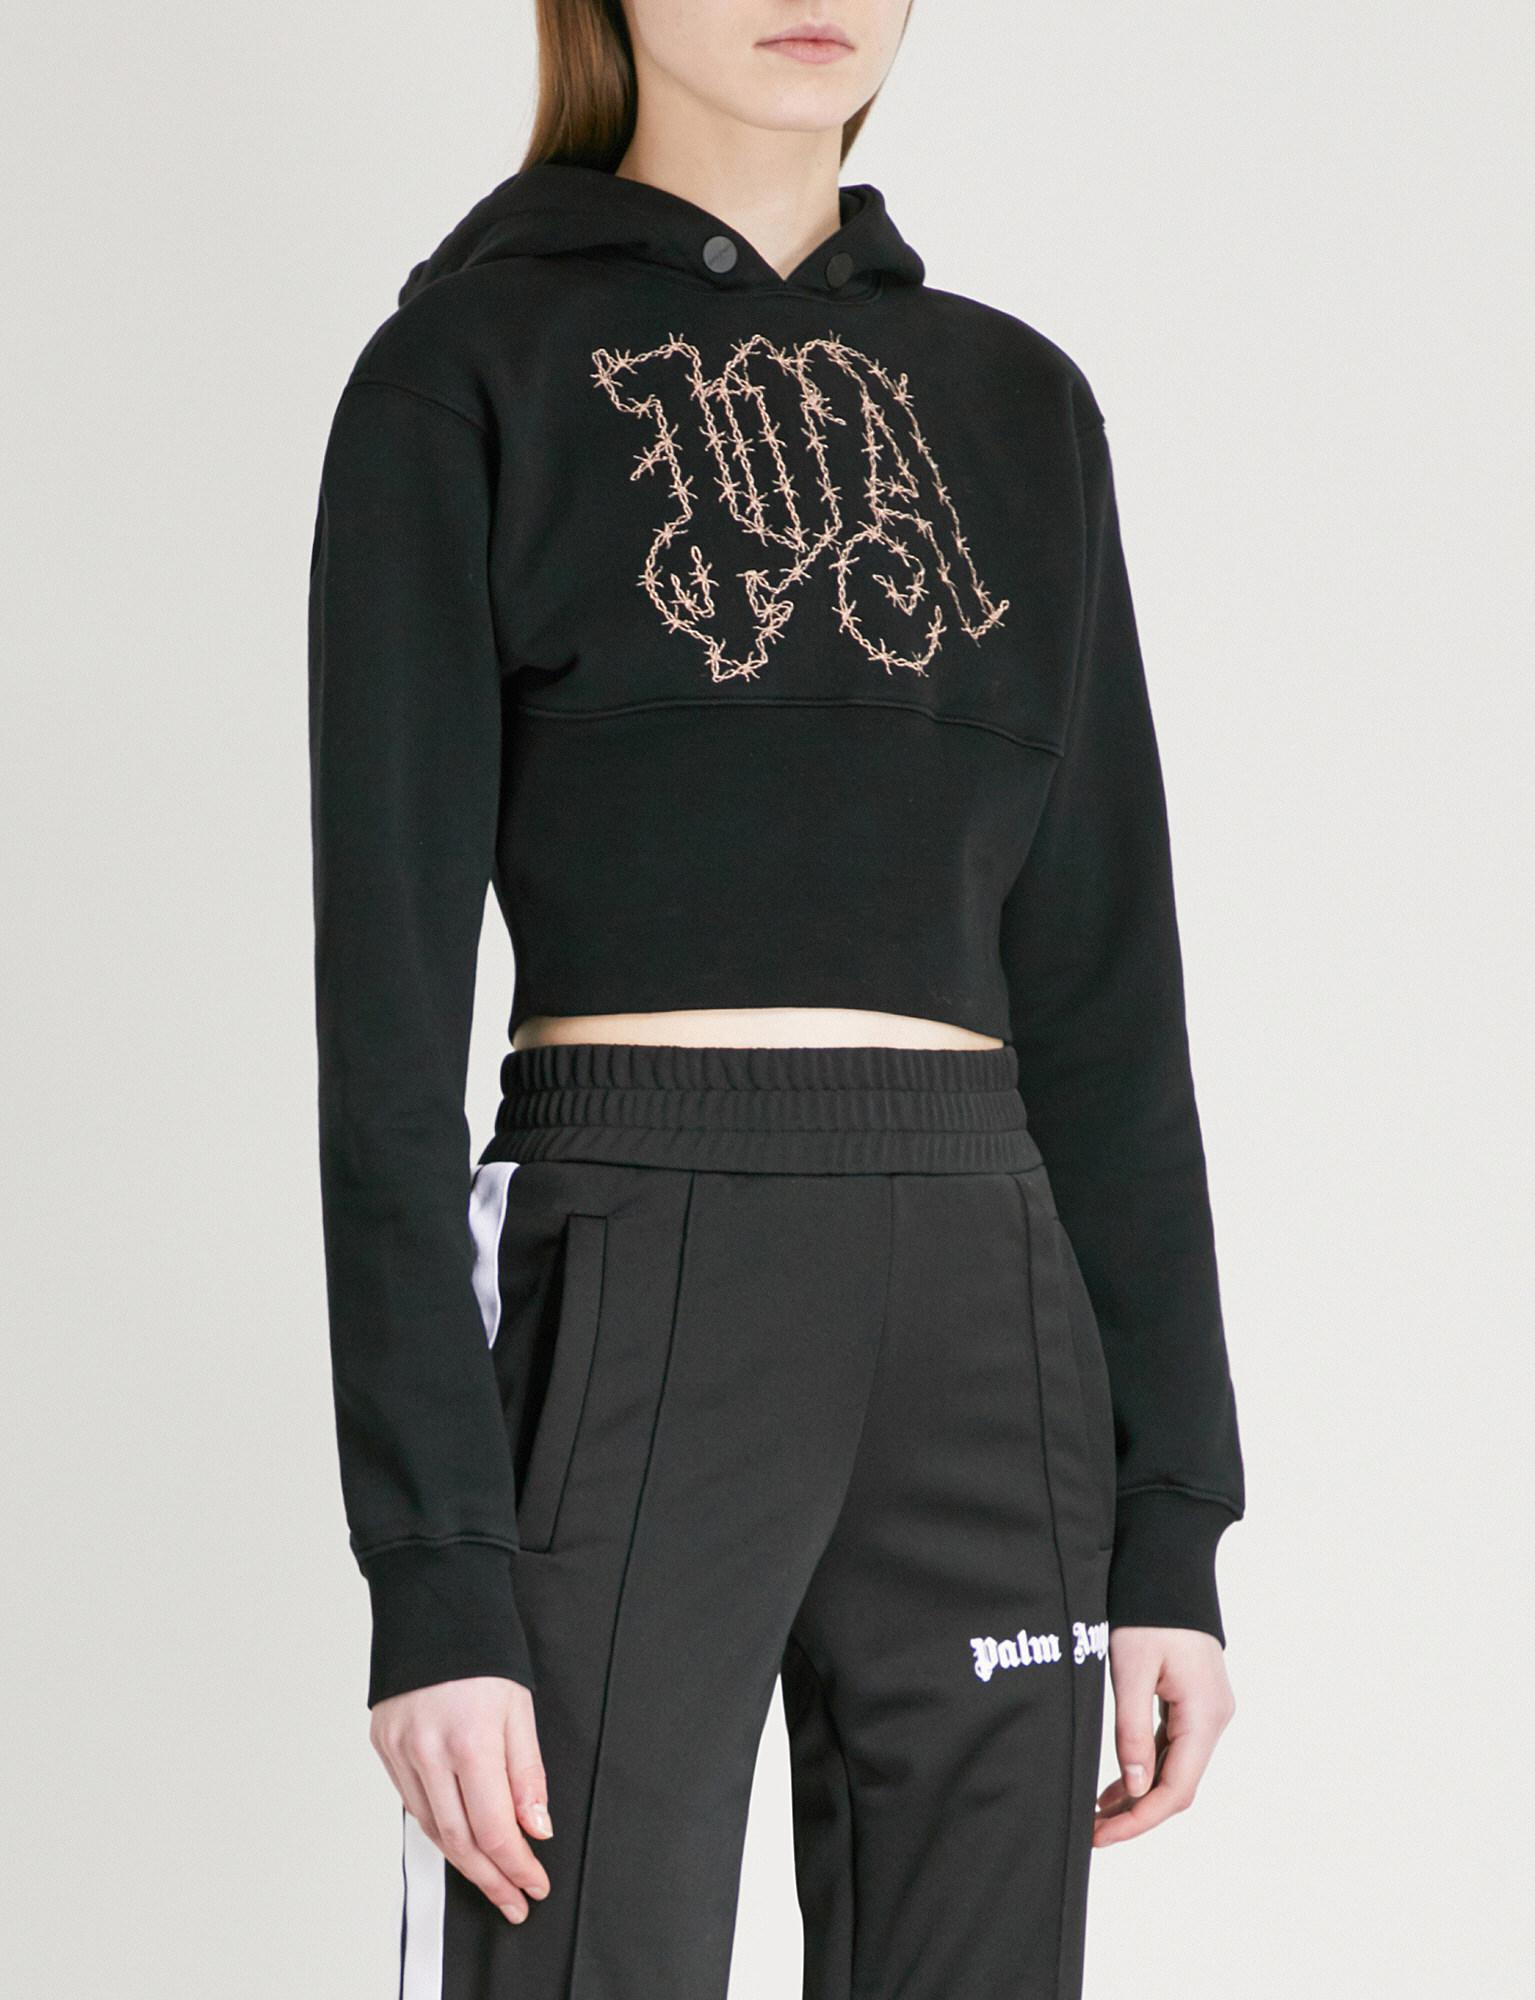 421e4a49e5429 palm-angels-Black-copper-Barbwire-Cropped-Cotton-jersey-Hoody.jpeg